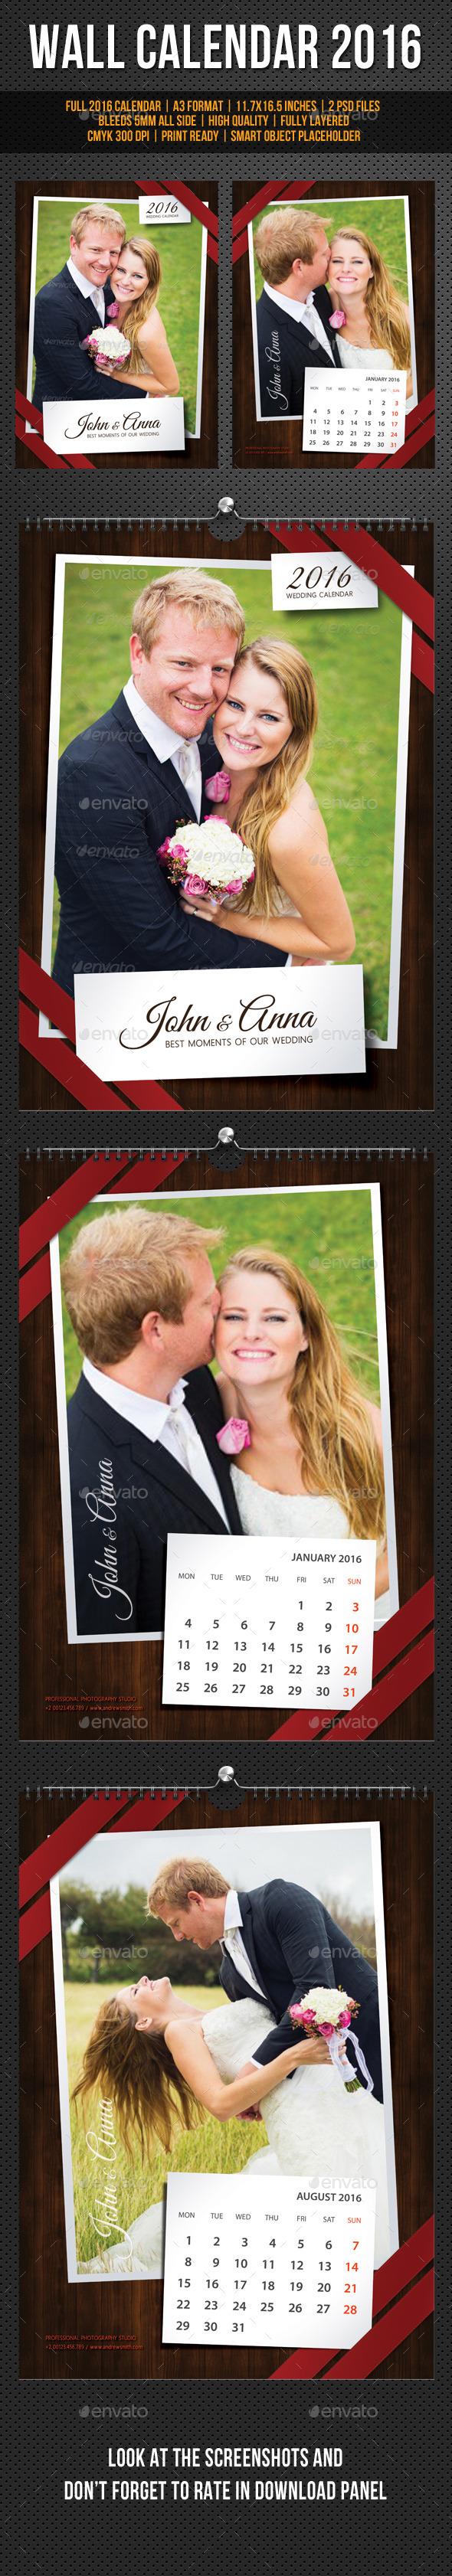 GraphicRiver Wedding Wall Calendar A3 2016 11767977